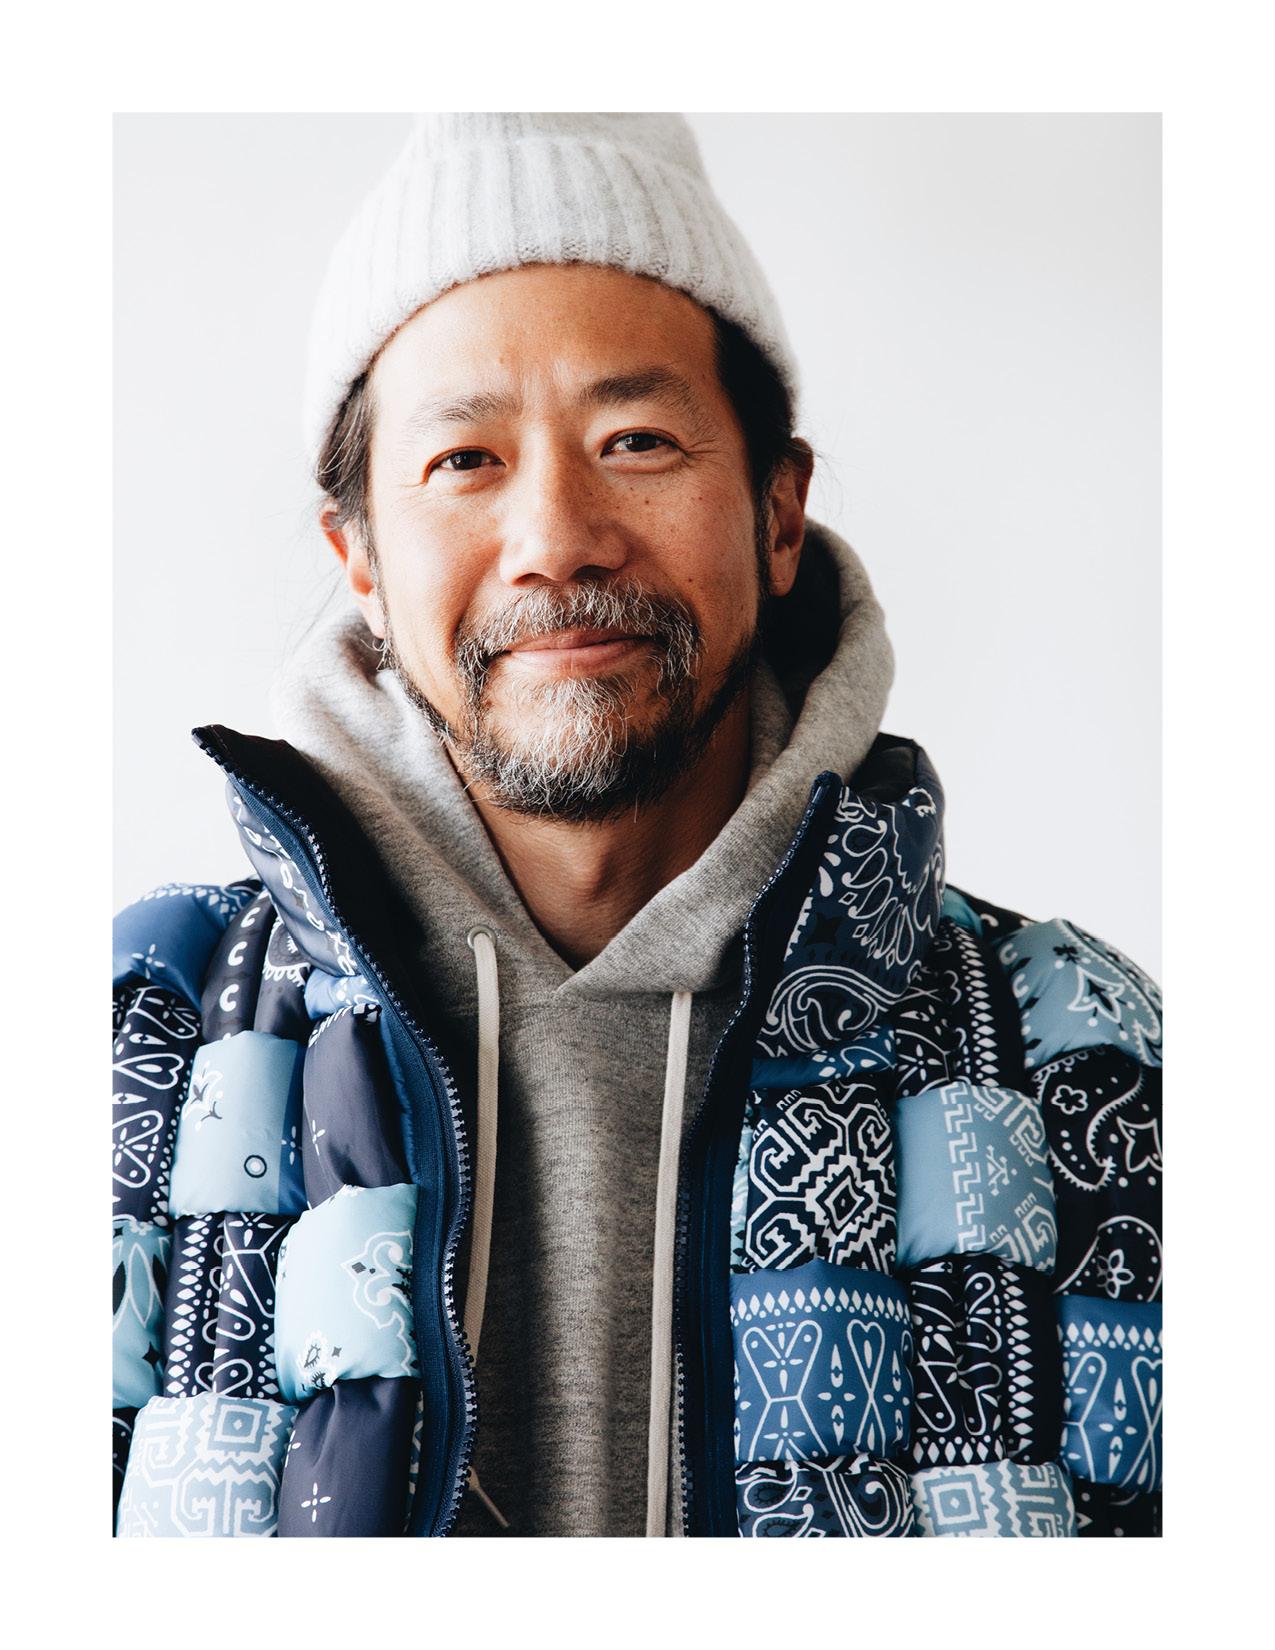 kapital bandana print nylon keel-weaving vest, howlin' king jammy hat, orslow hooded sweatshirt on body